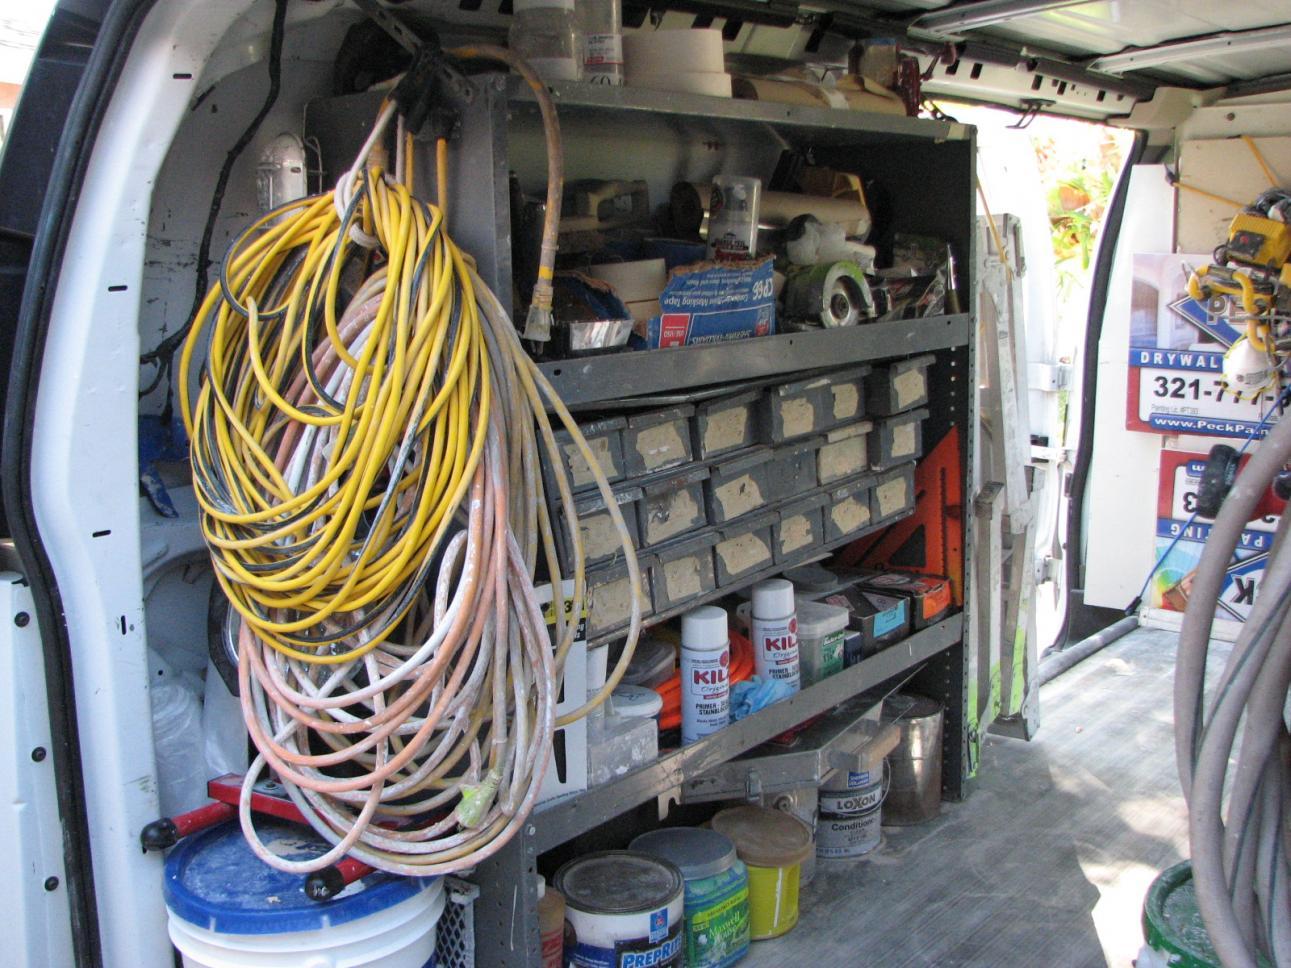 van storage (pic's please) - vehicles - contractor talk Storage Ideas Van